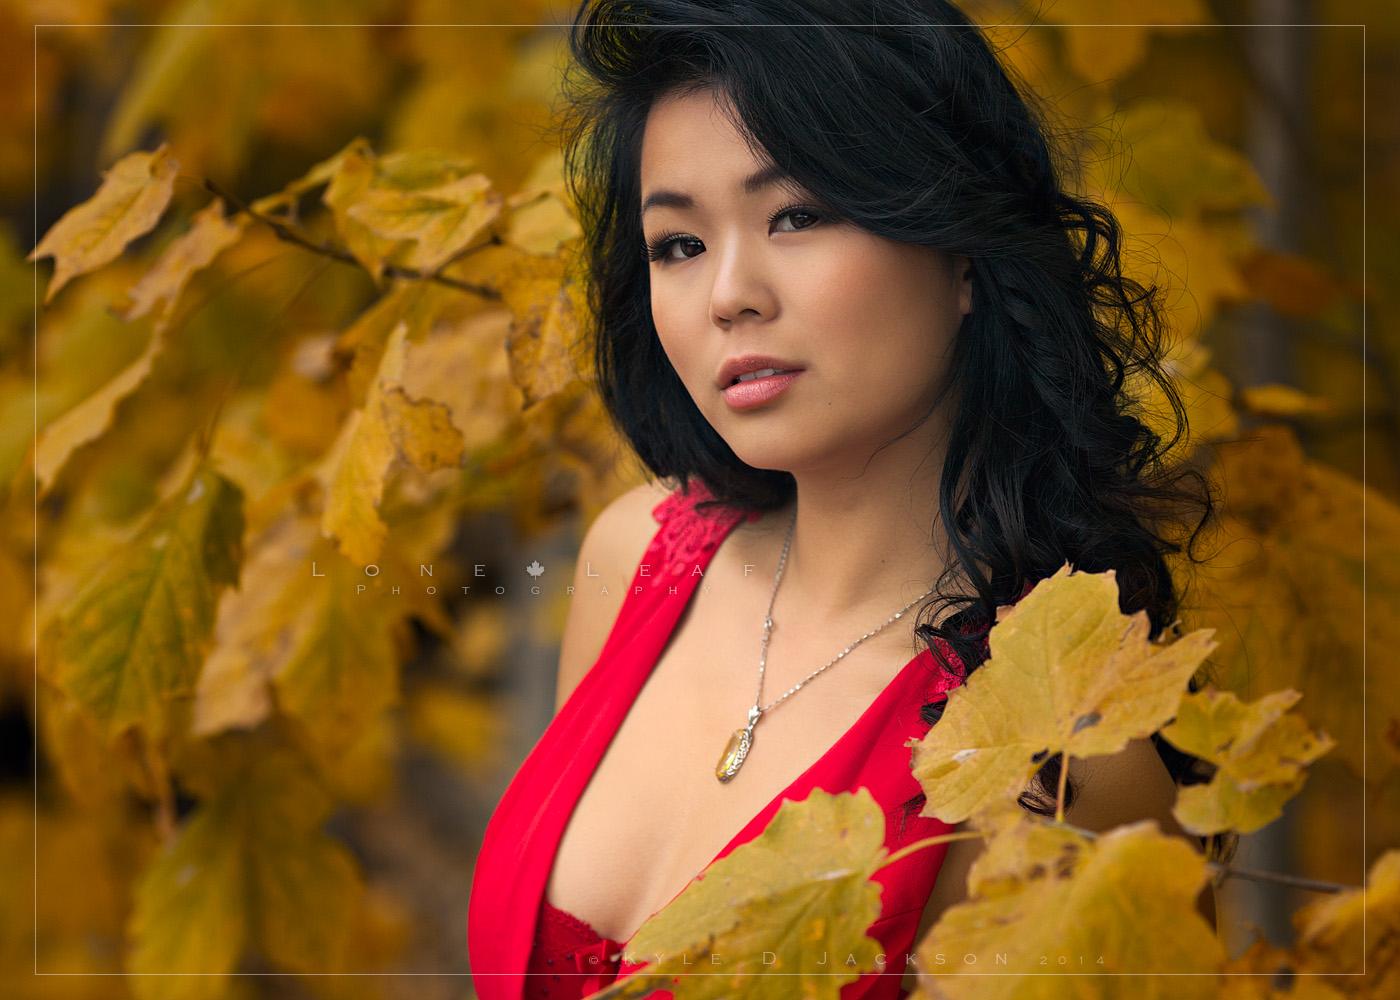 Photoshoot with Tammy, Ottawa, Ontario, 13 October 2014.